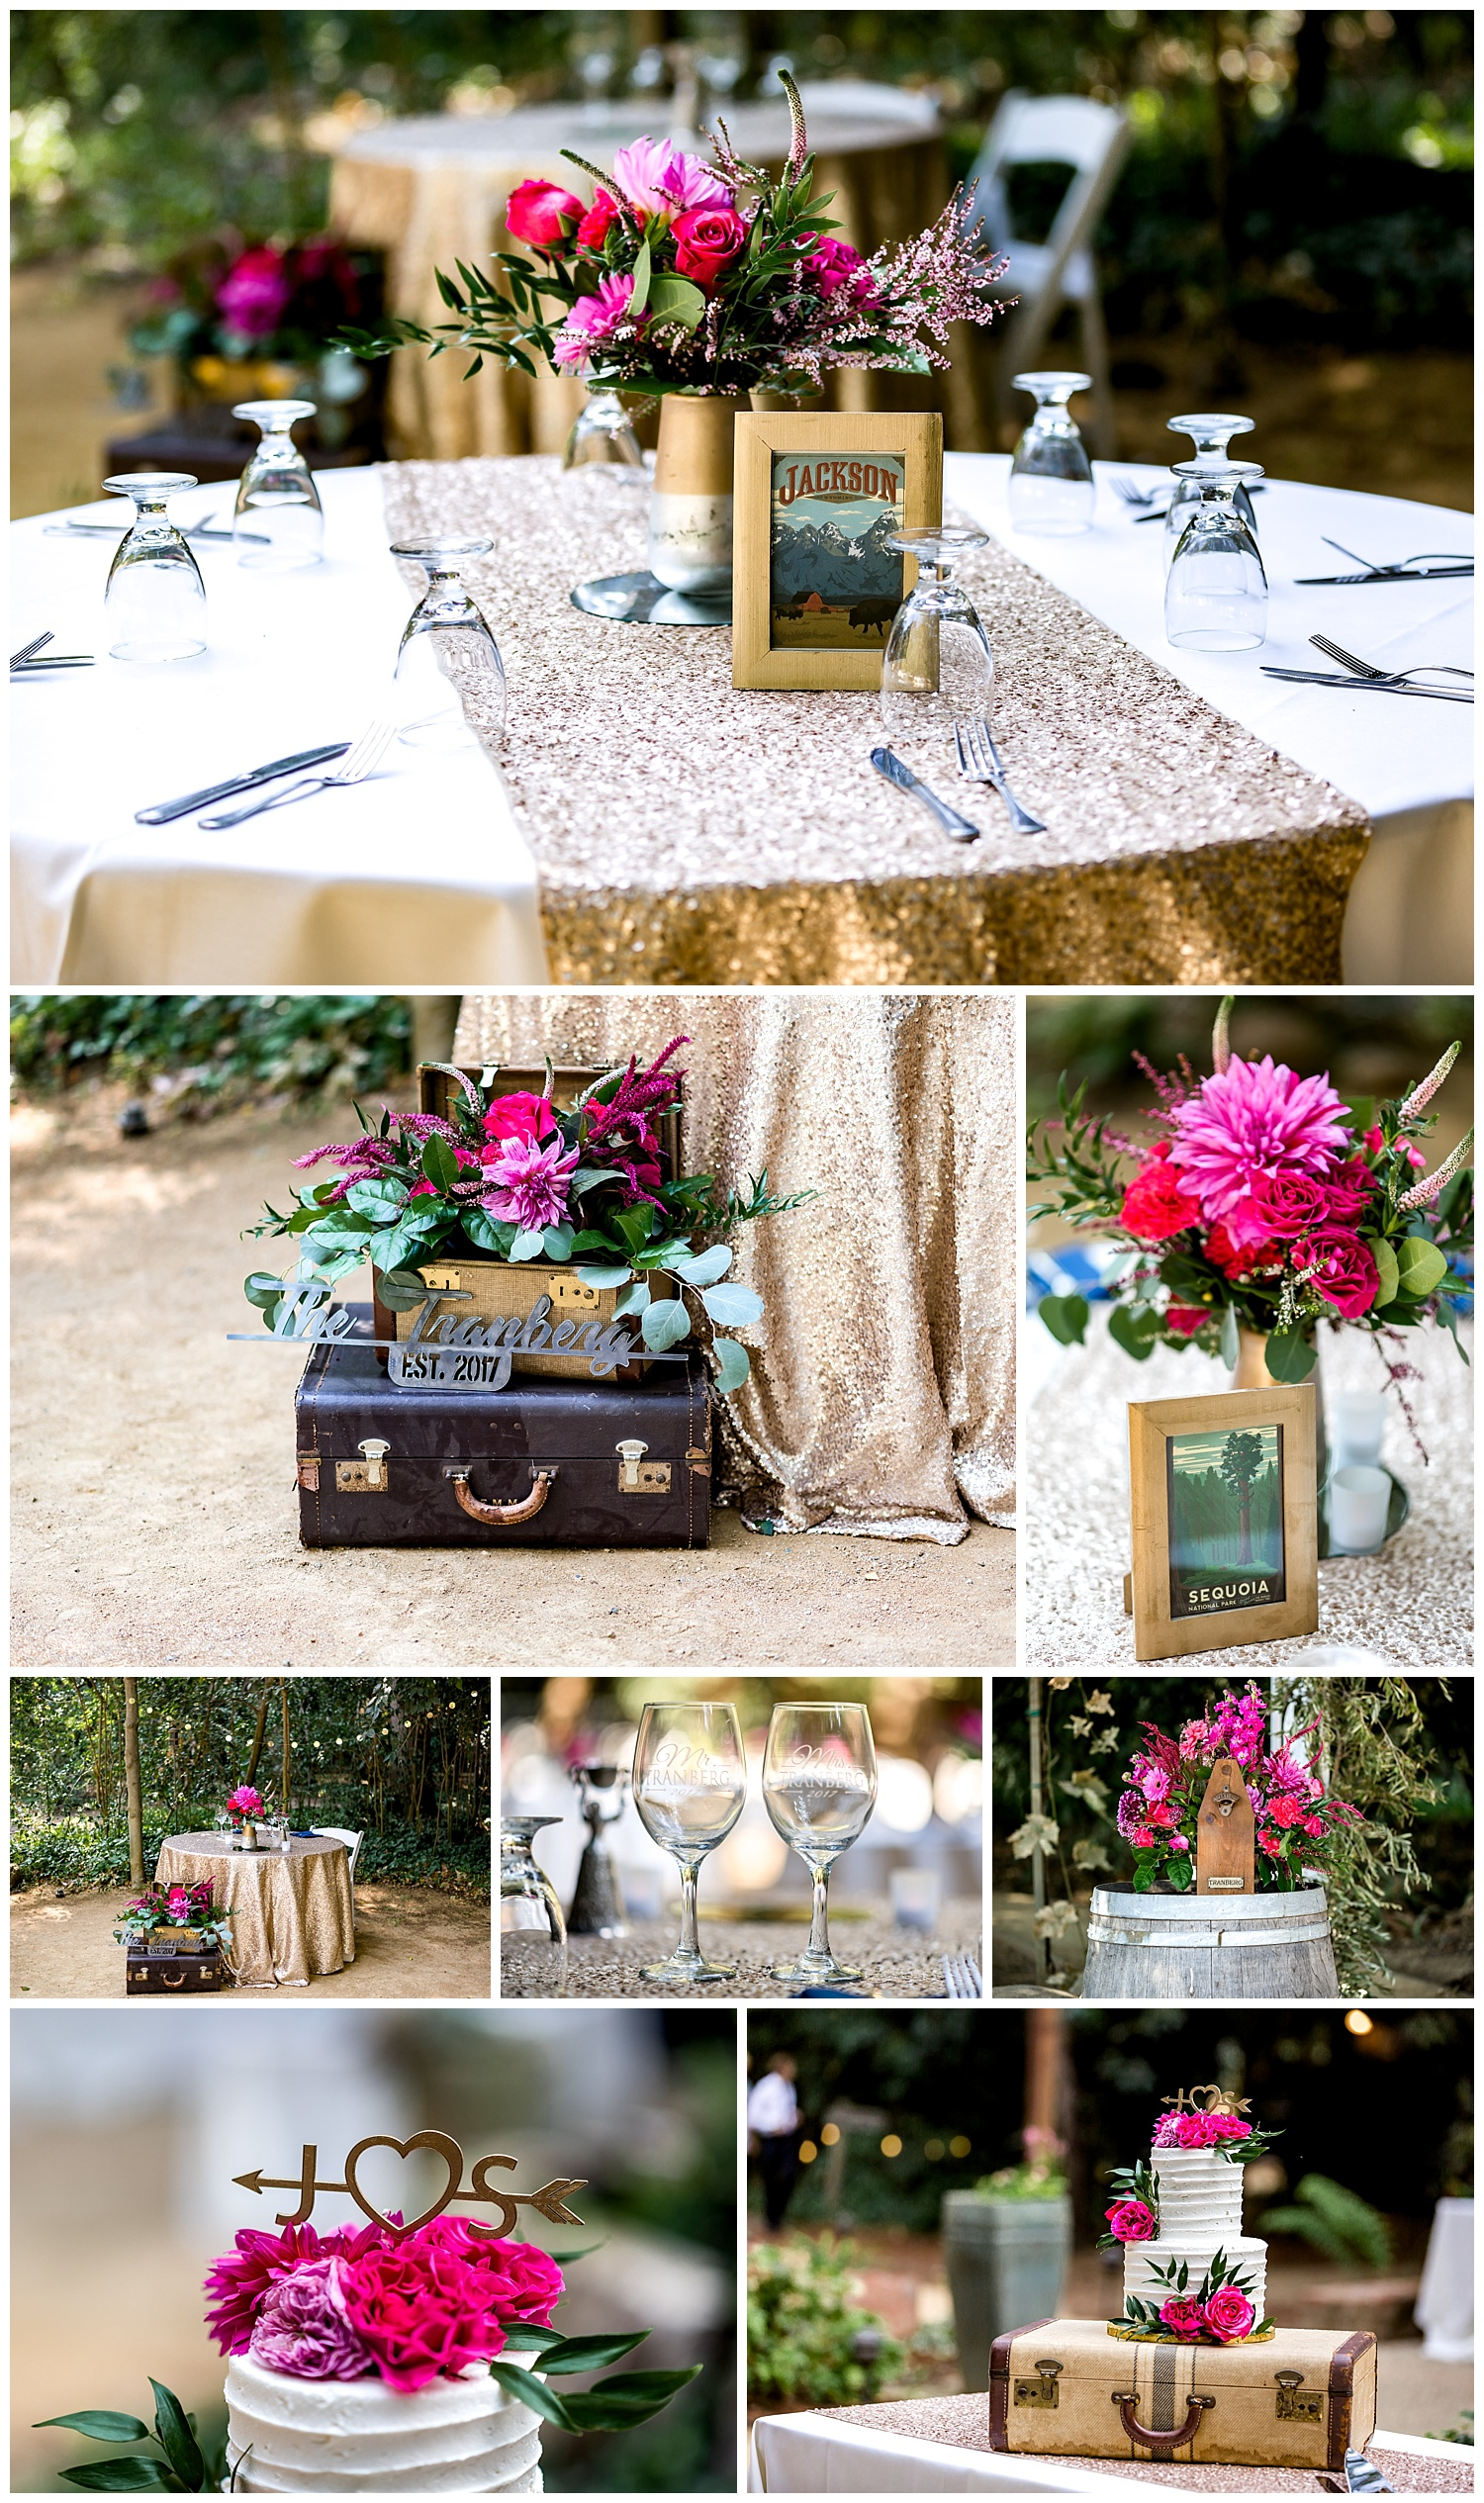 gale-vineyards-wedding_the-530-bride-js